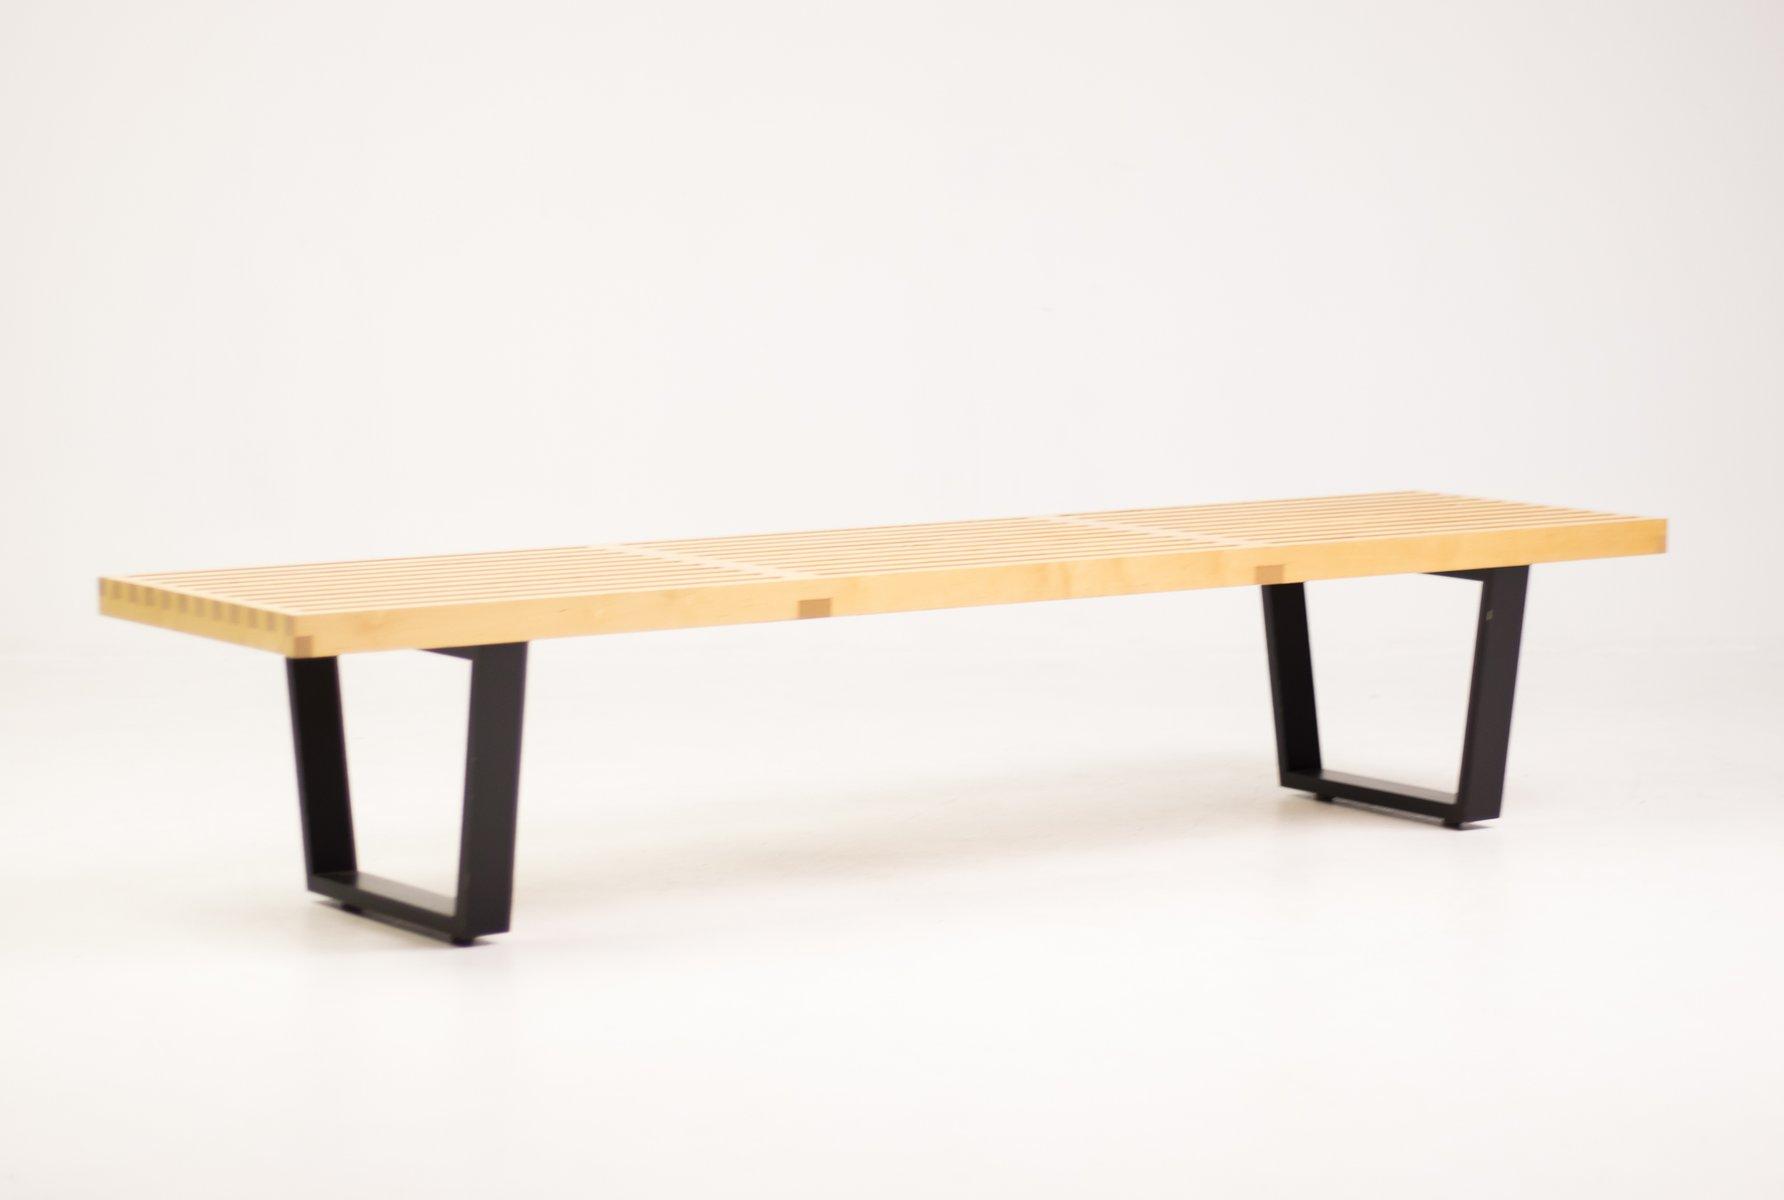 Vintage Ash Platform Bench by George Nelson for Herman Miller for